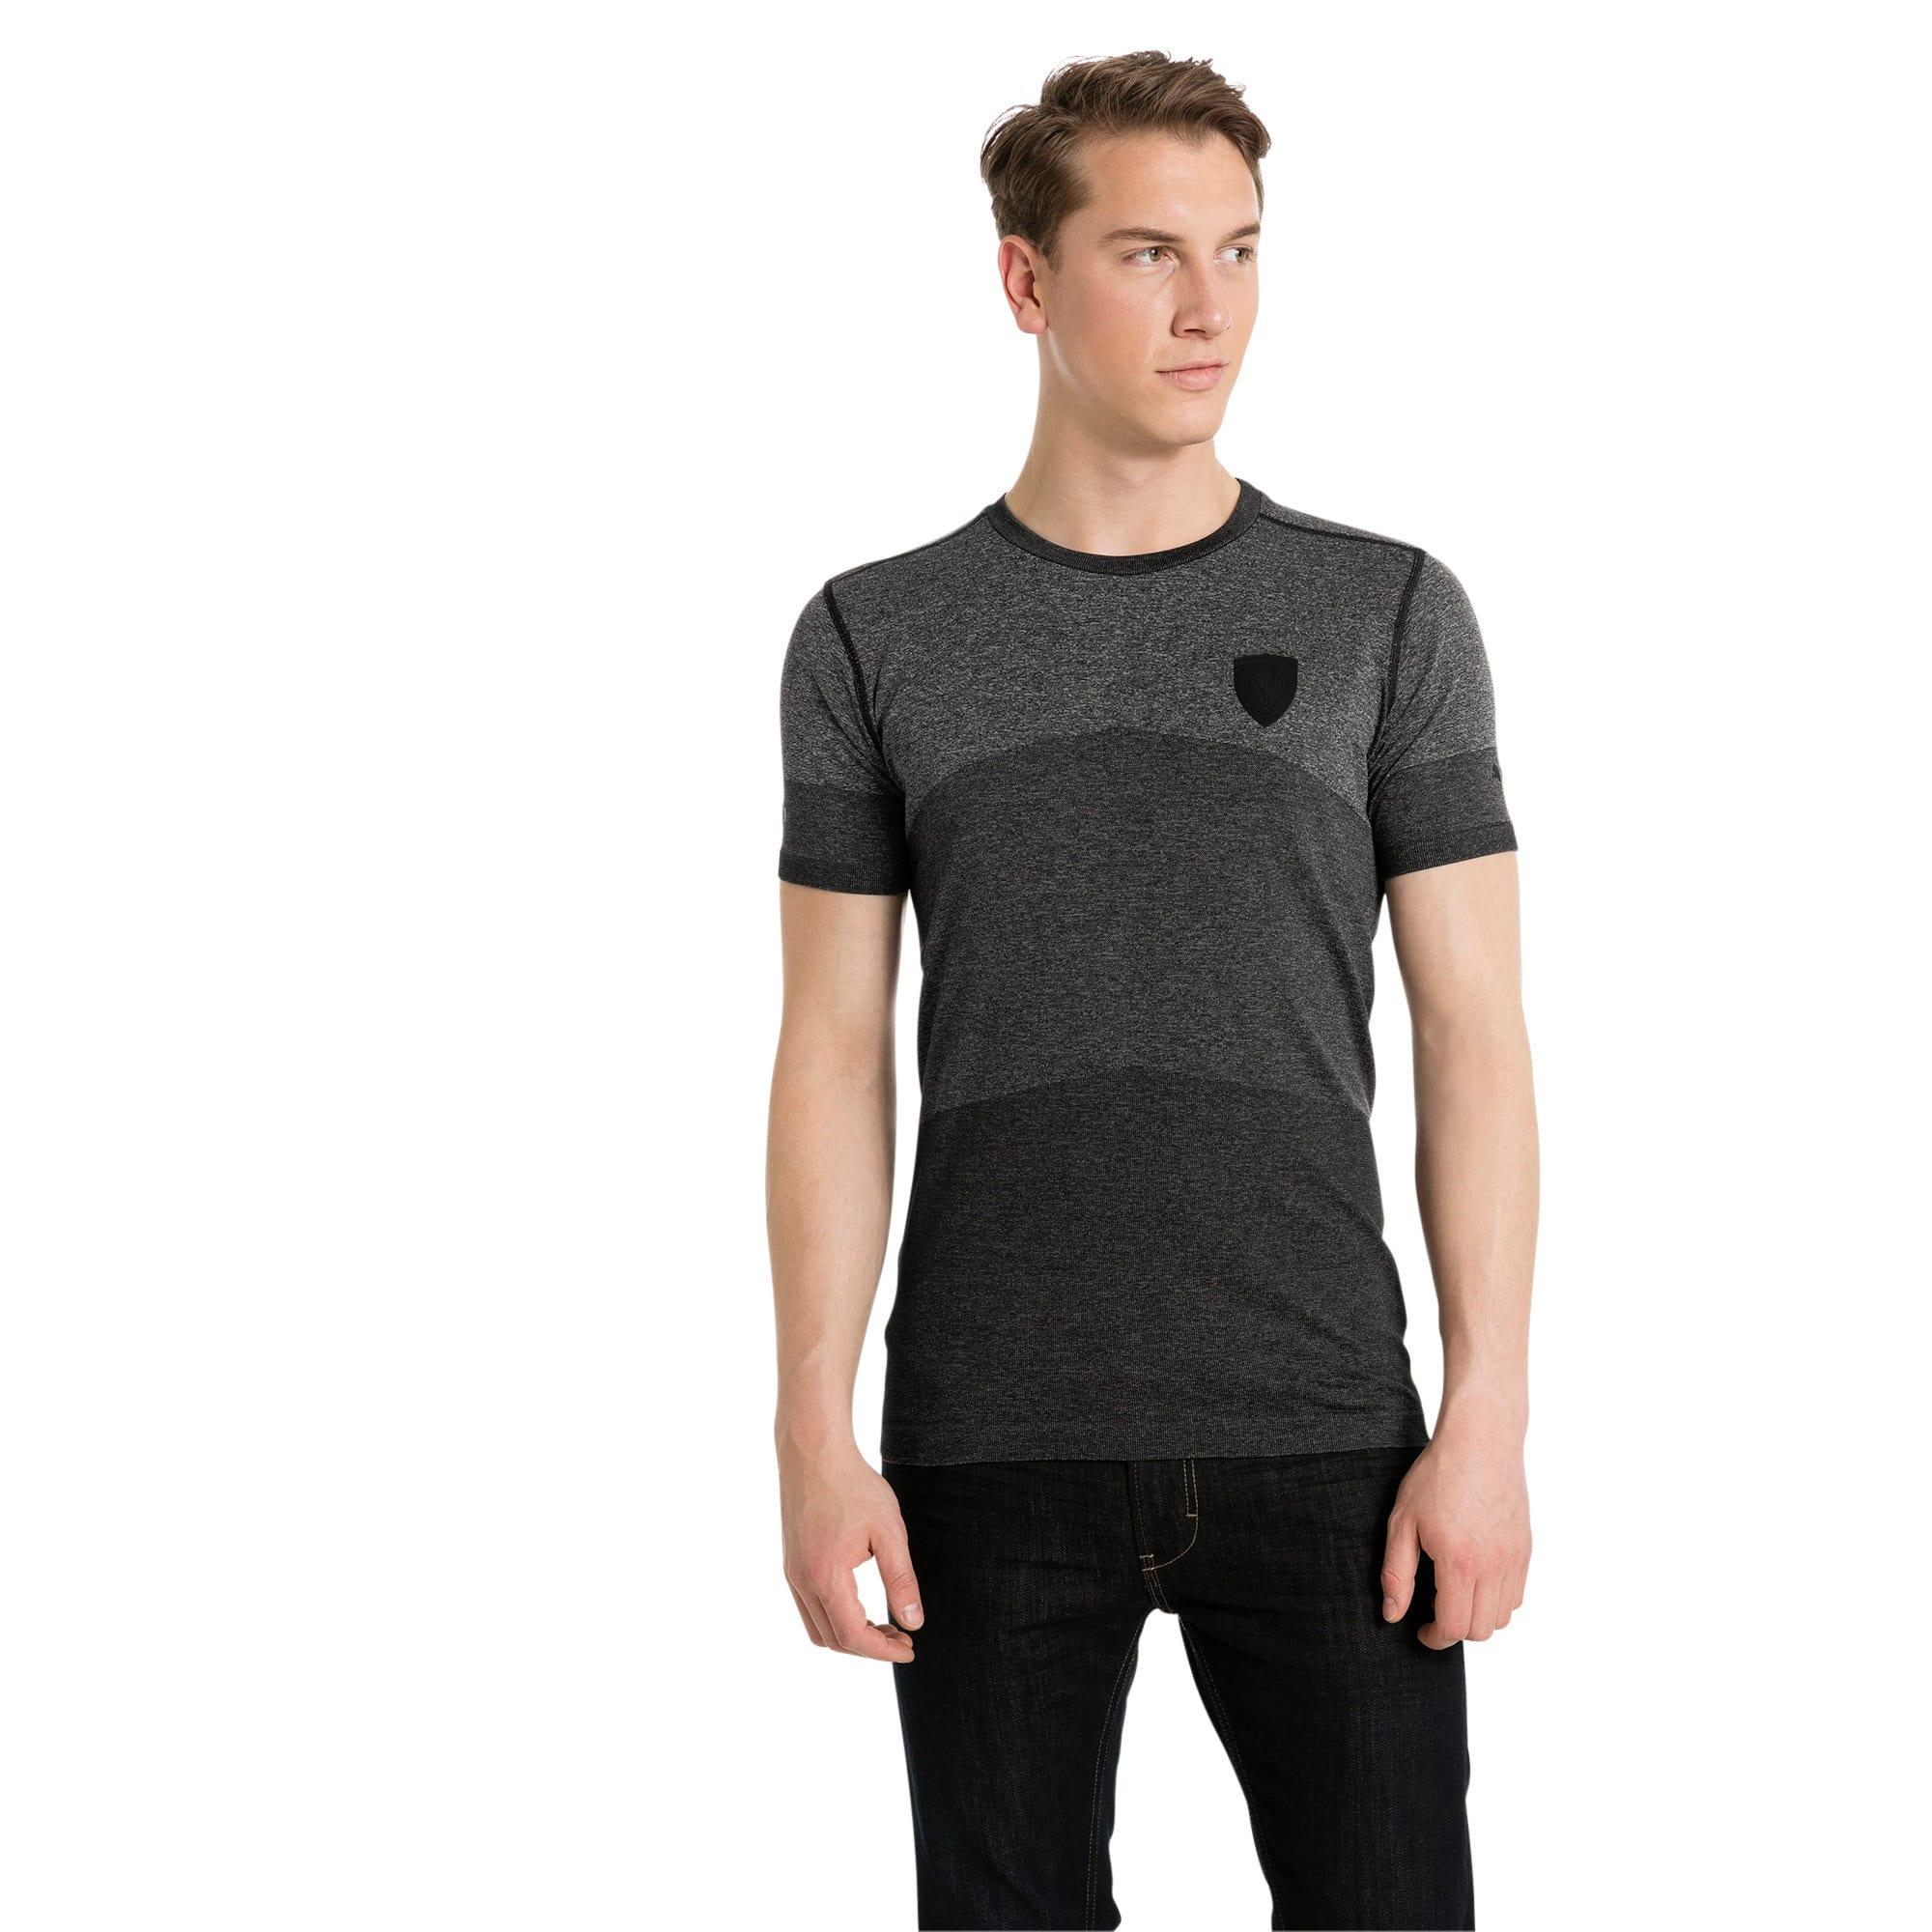 Thumbnail 1 of Ferrari Lifestyle Men's evoKNIT T-Shirt, Moonless Night Heather, medium-IND